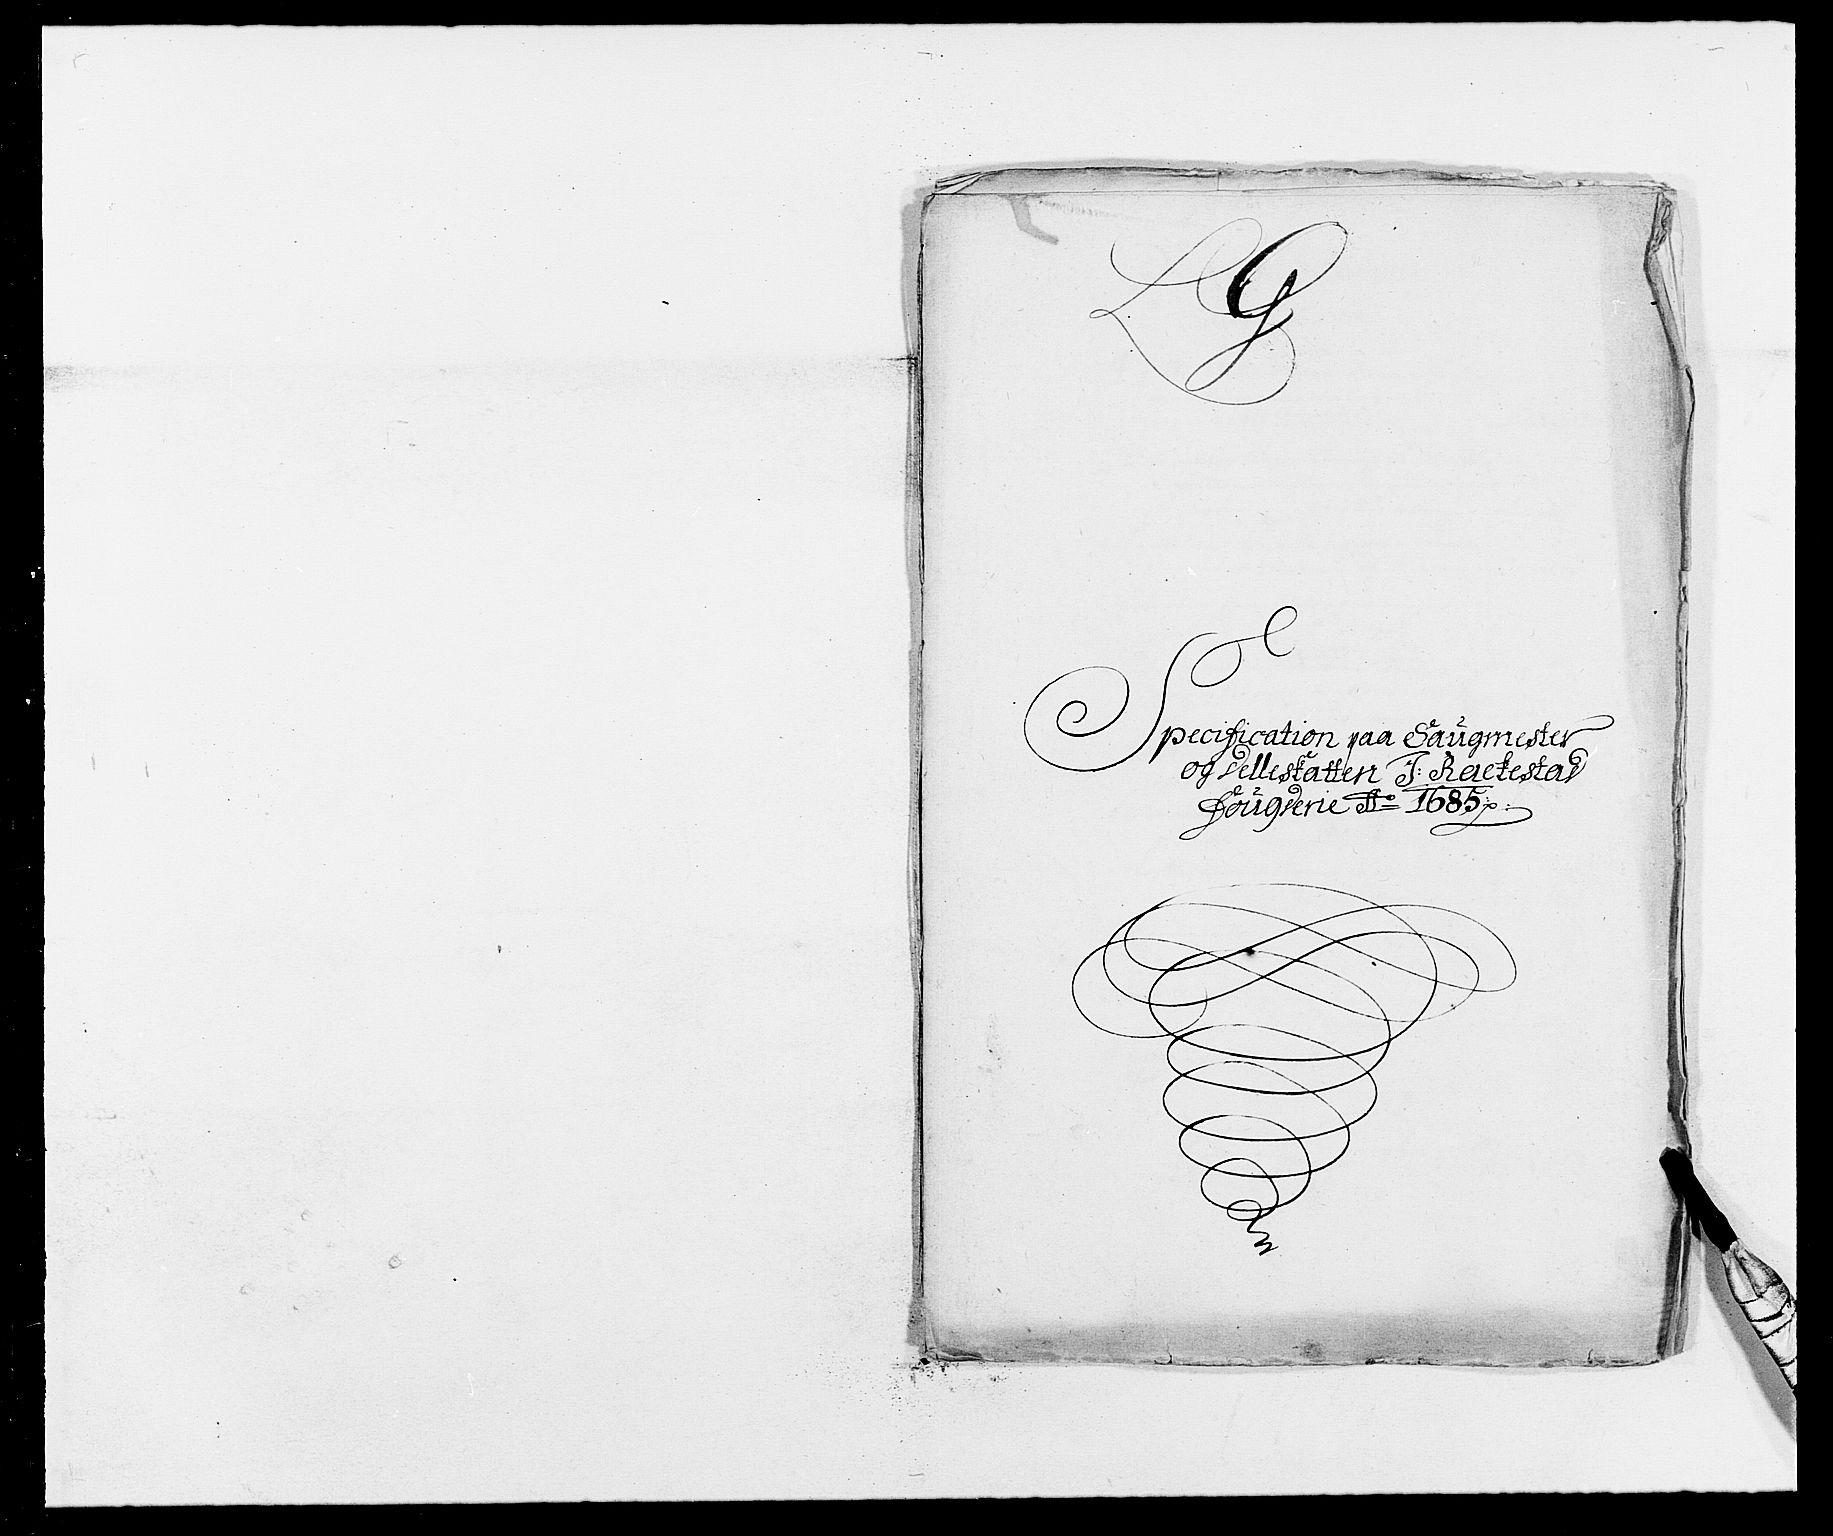 RA, Rentekammeret inntil 1814, Reviderte regnskaper, Fogderegnskap, R05/L0275: Fogderegnskap Rakkestad, 1685-1686, s. 137